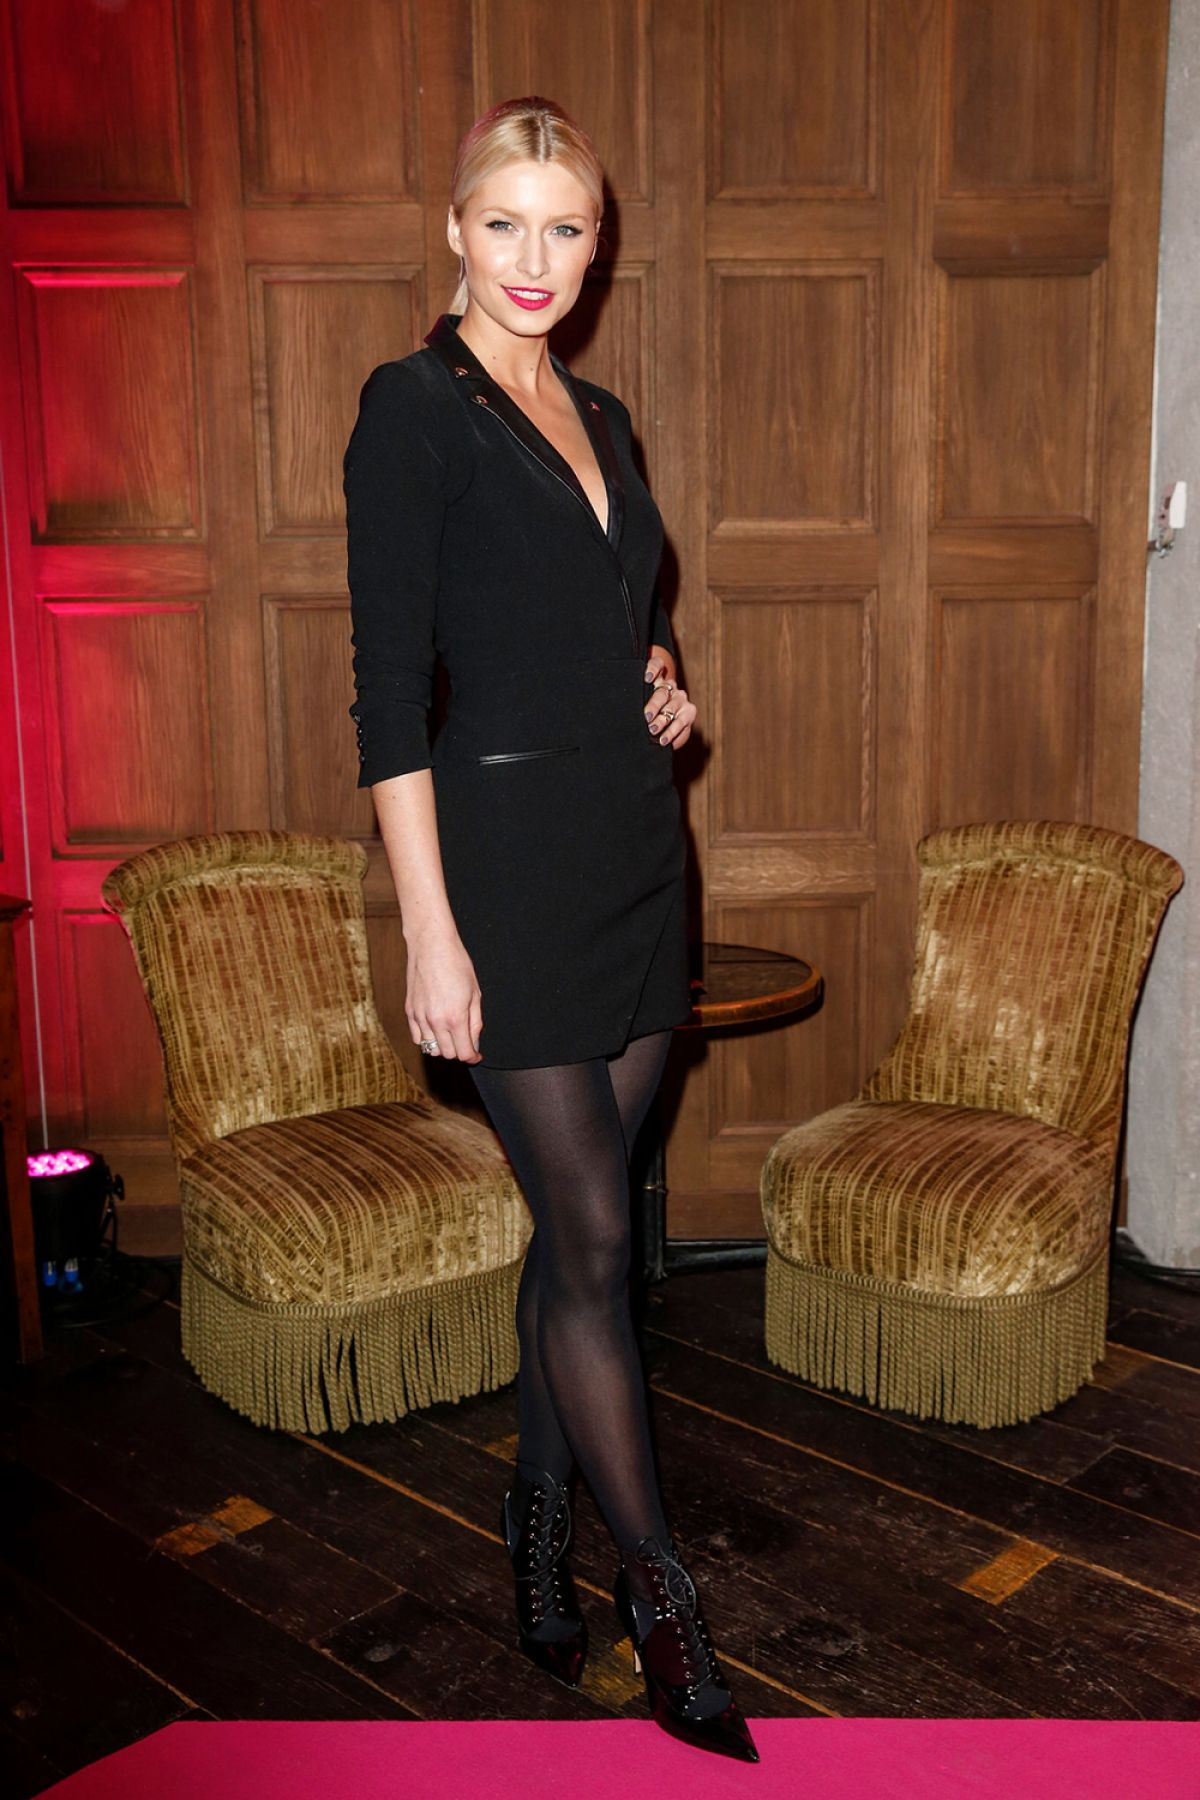 Lena Gercke At Itb Party Jt Touristik At Soho House In